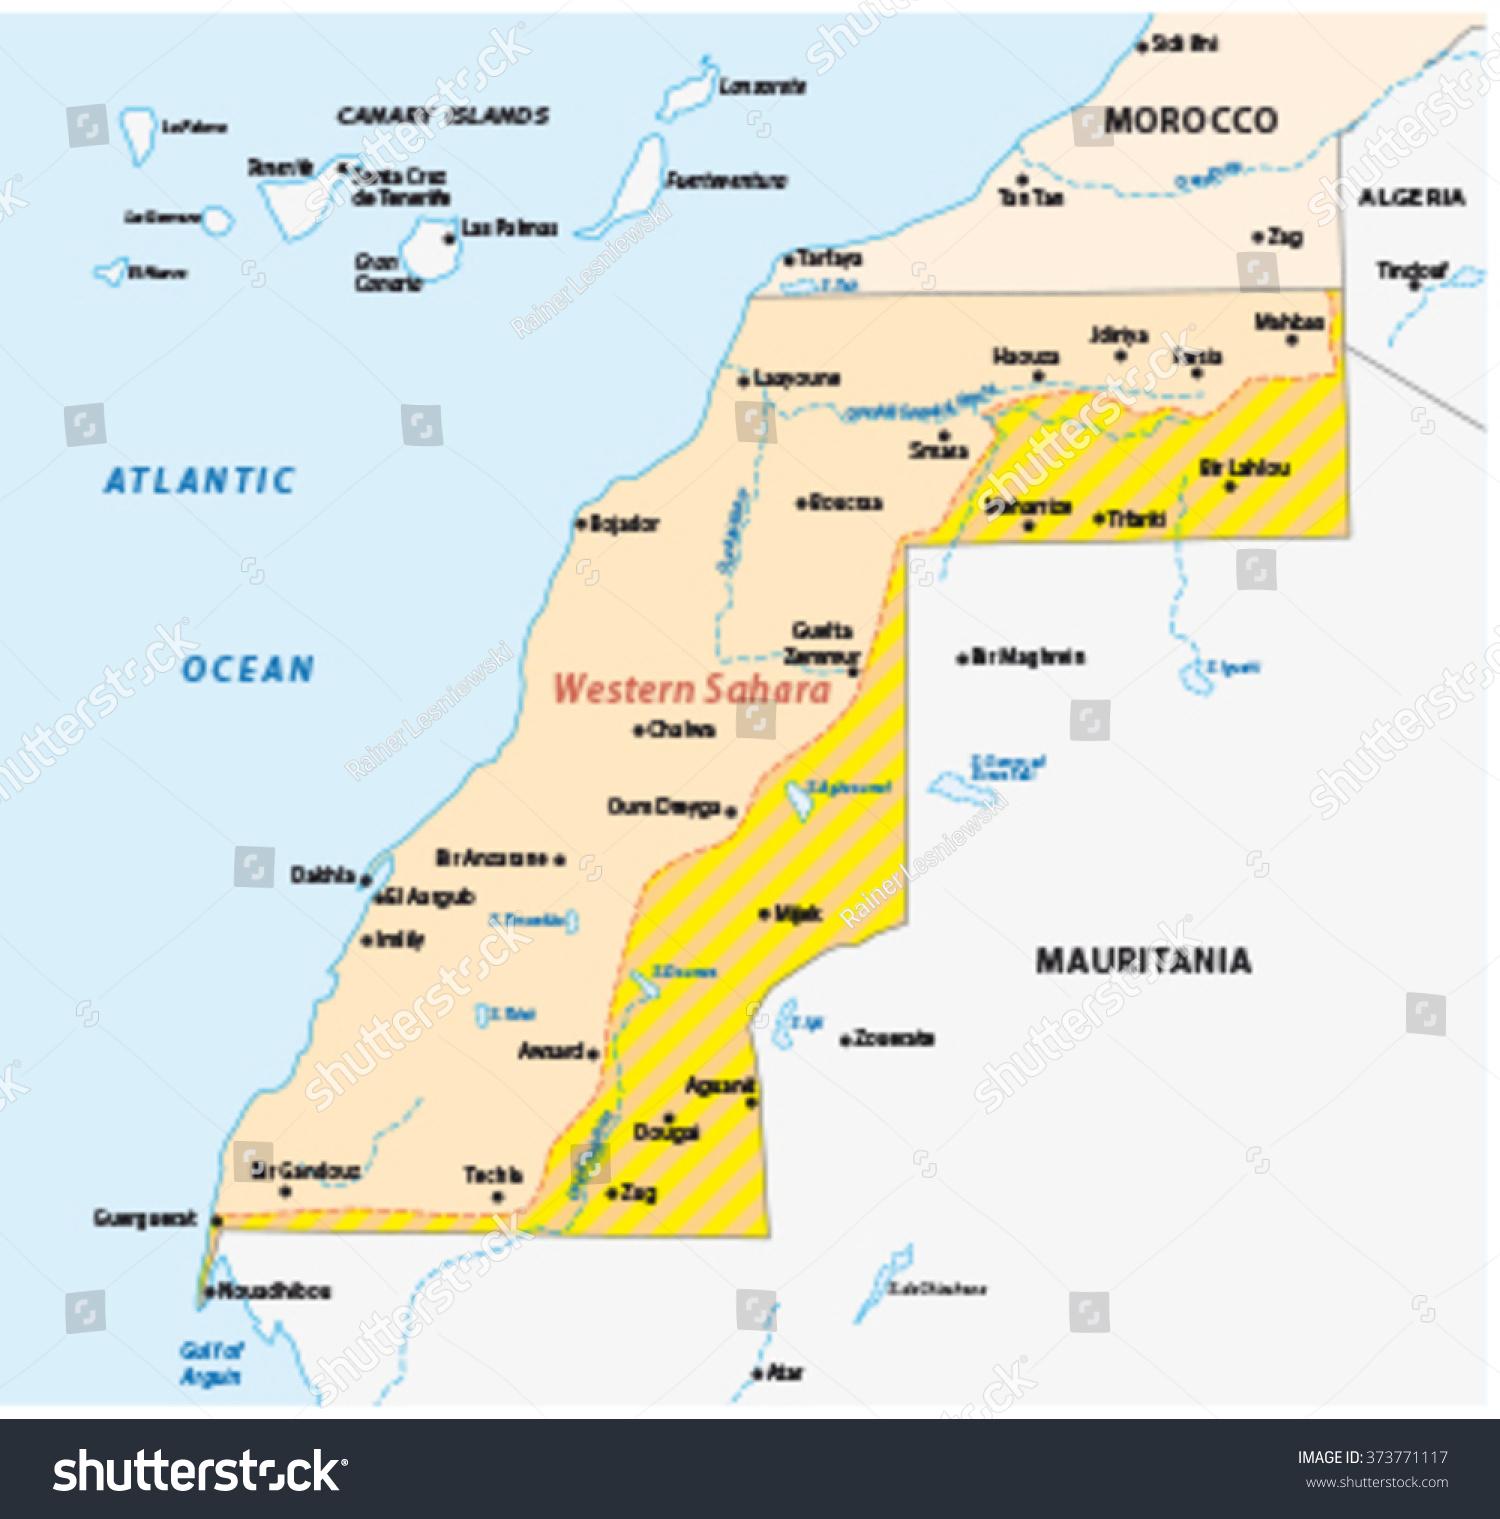 Western Sahara Map Stock Vector Shutterstock - Western sahara map